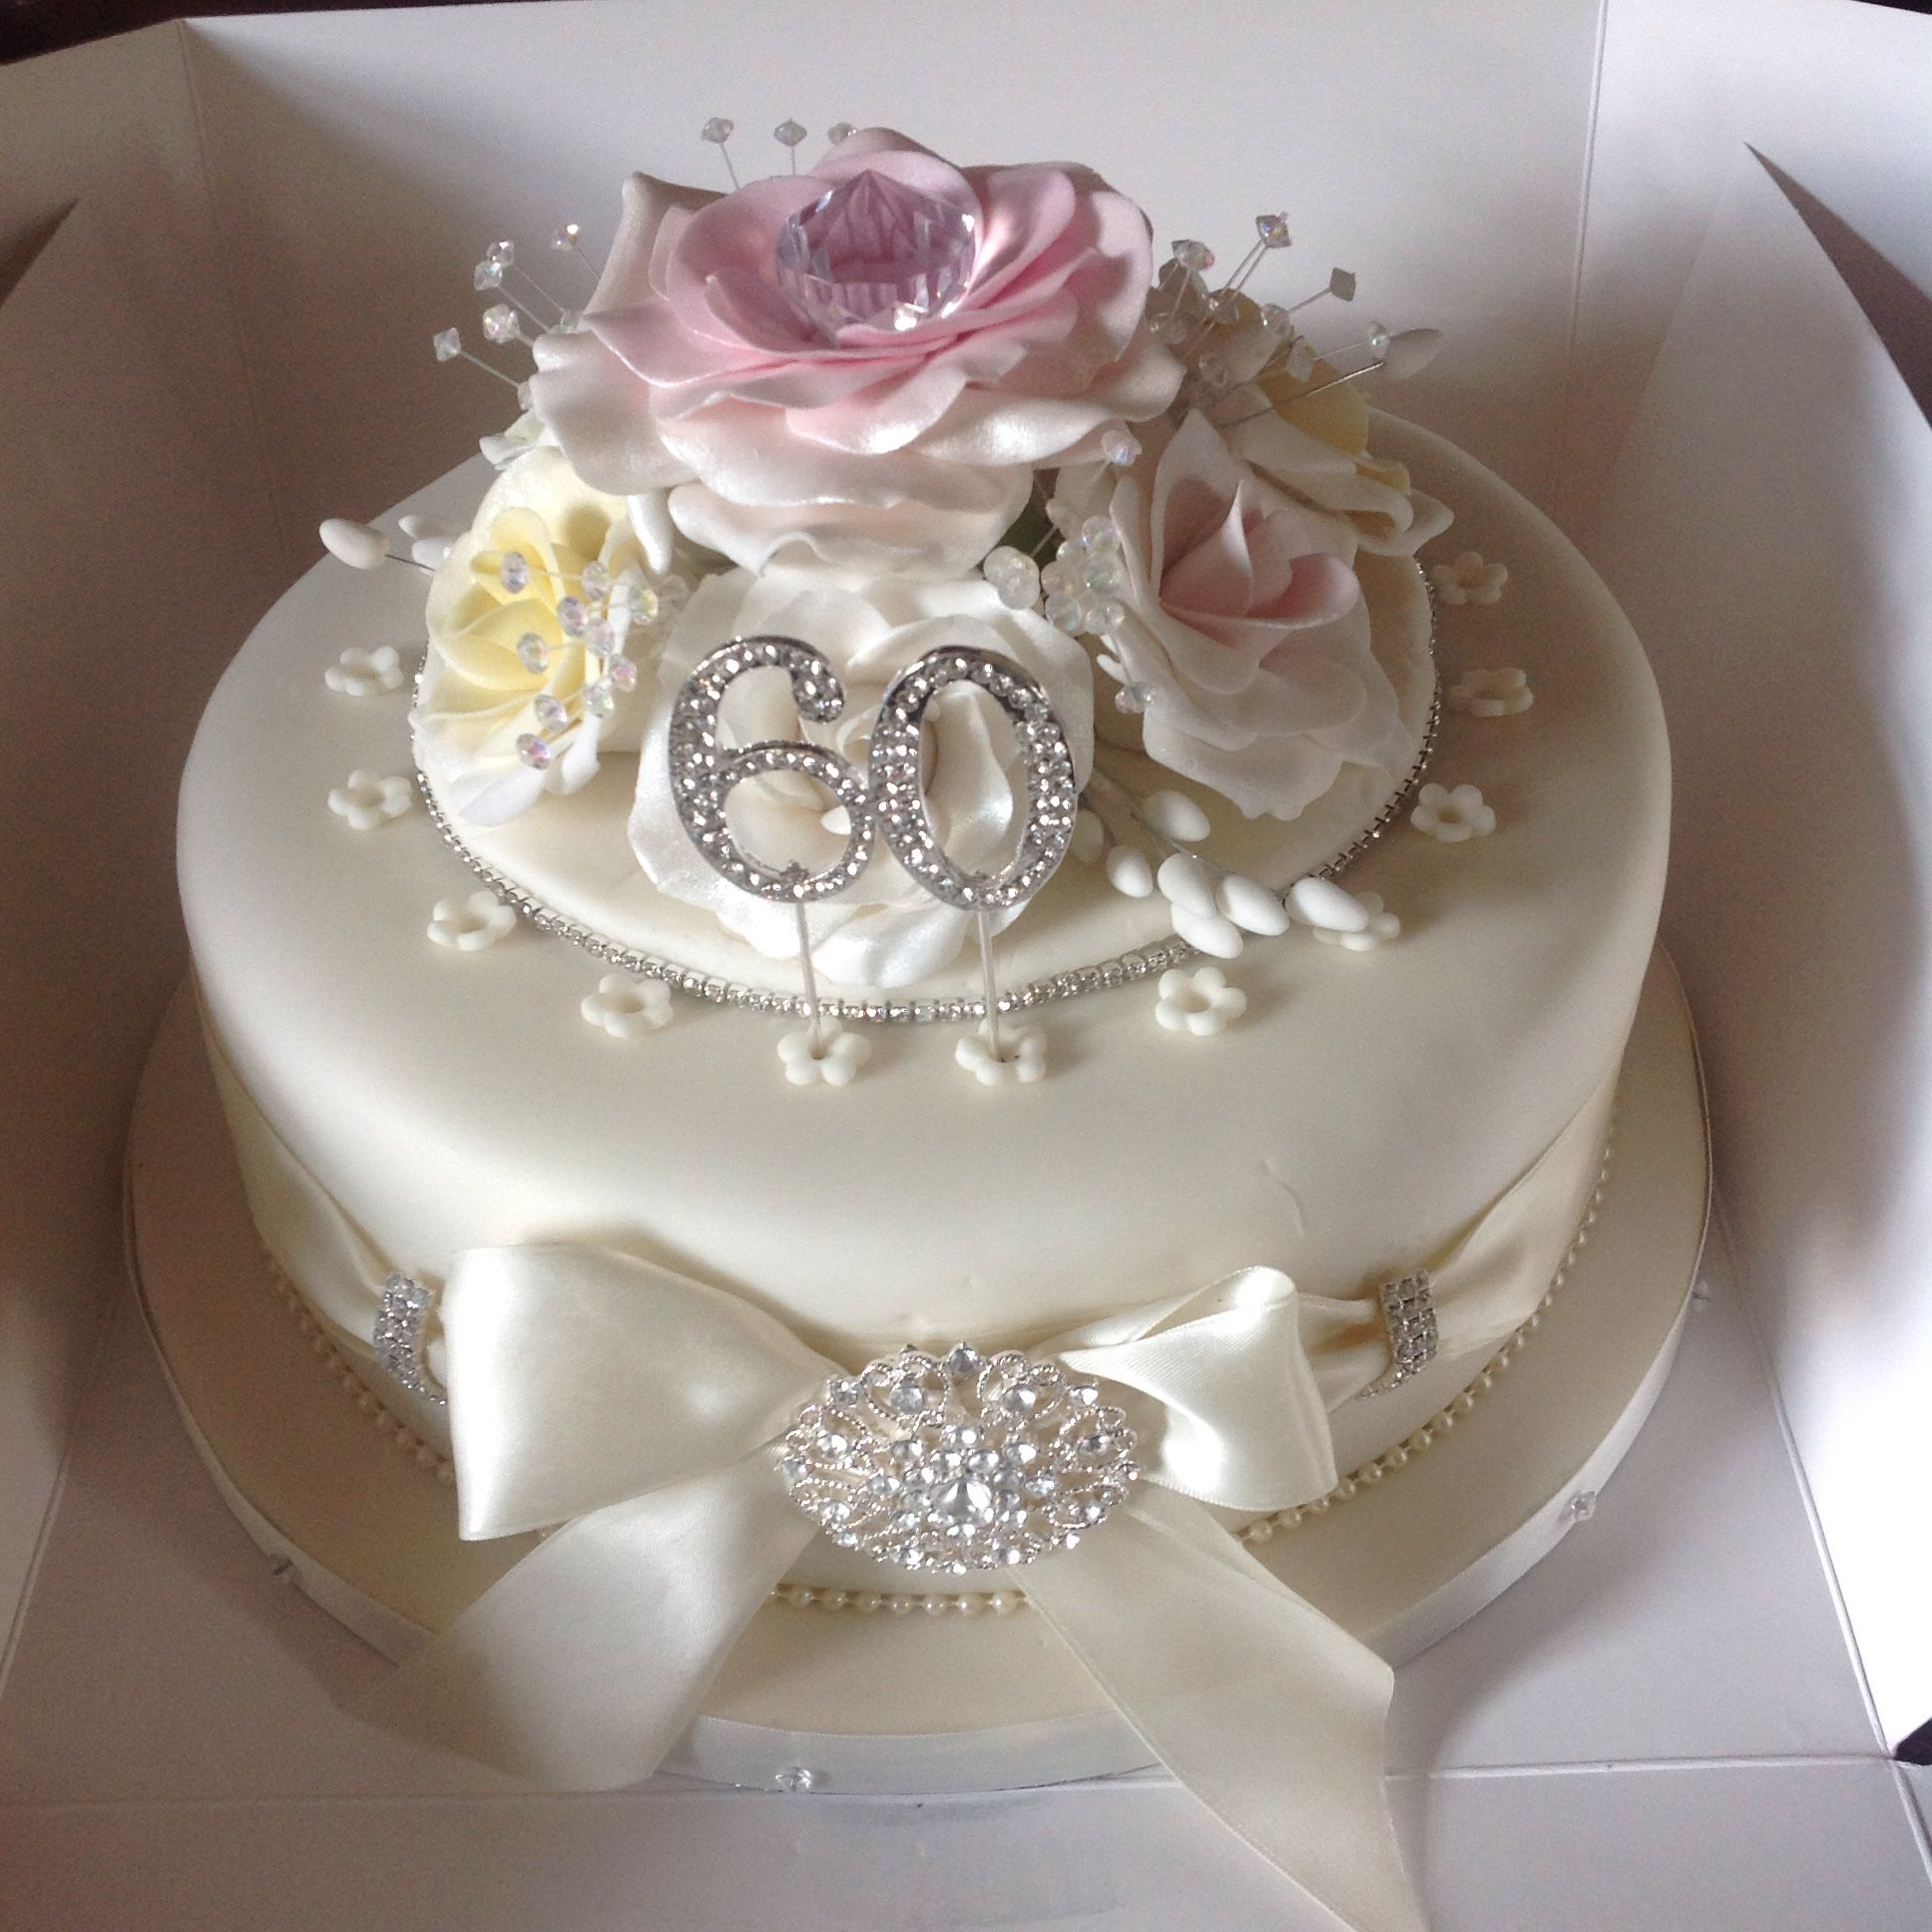 Diamond wedding anniversary cake, pastel coloured flowers